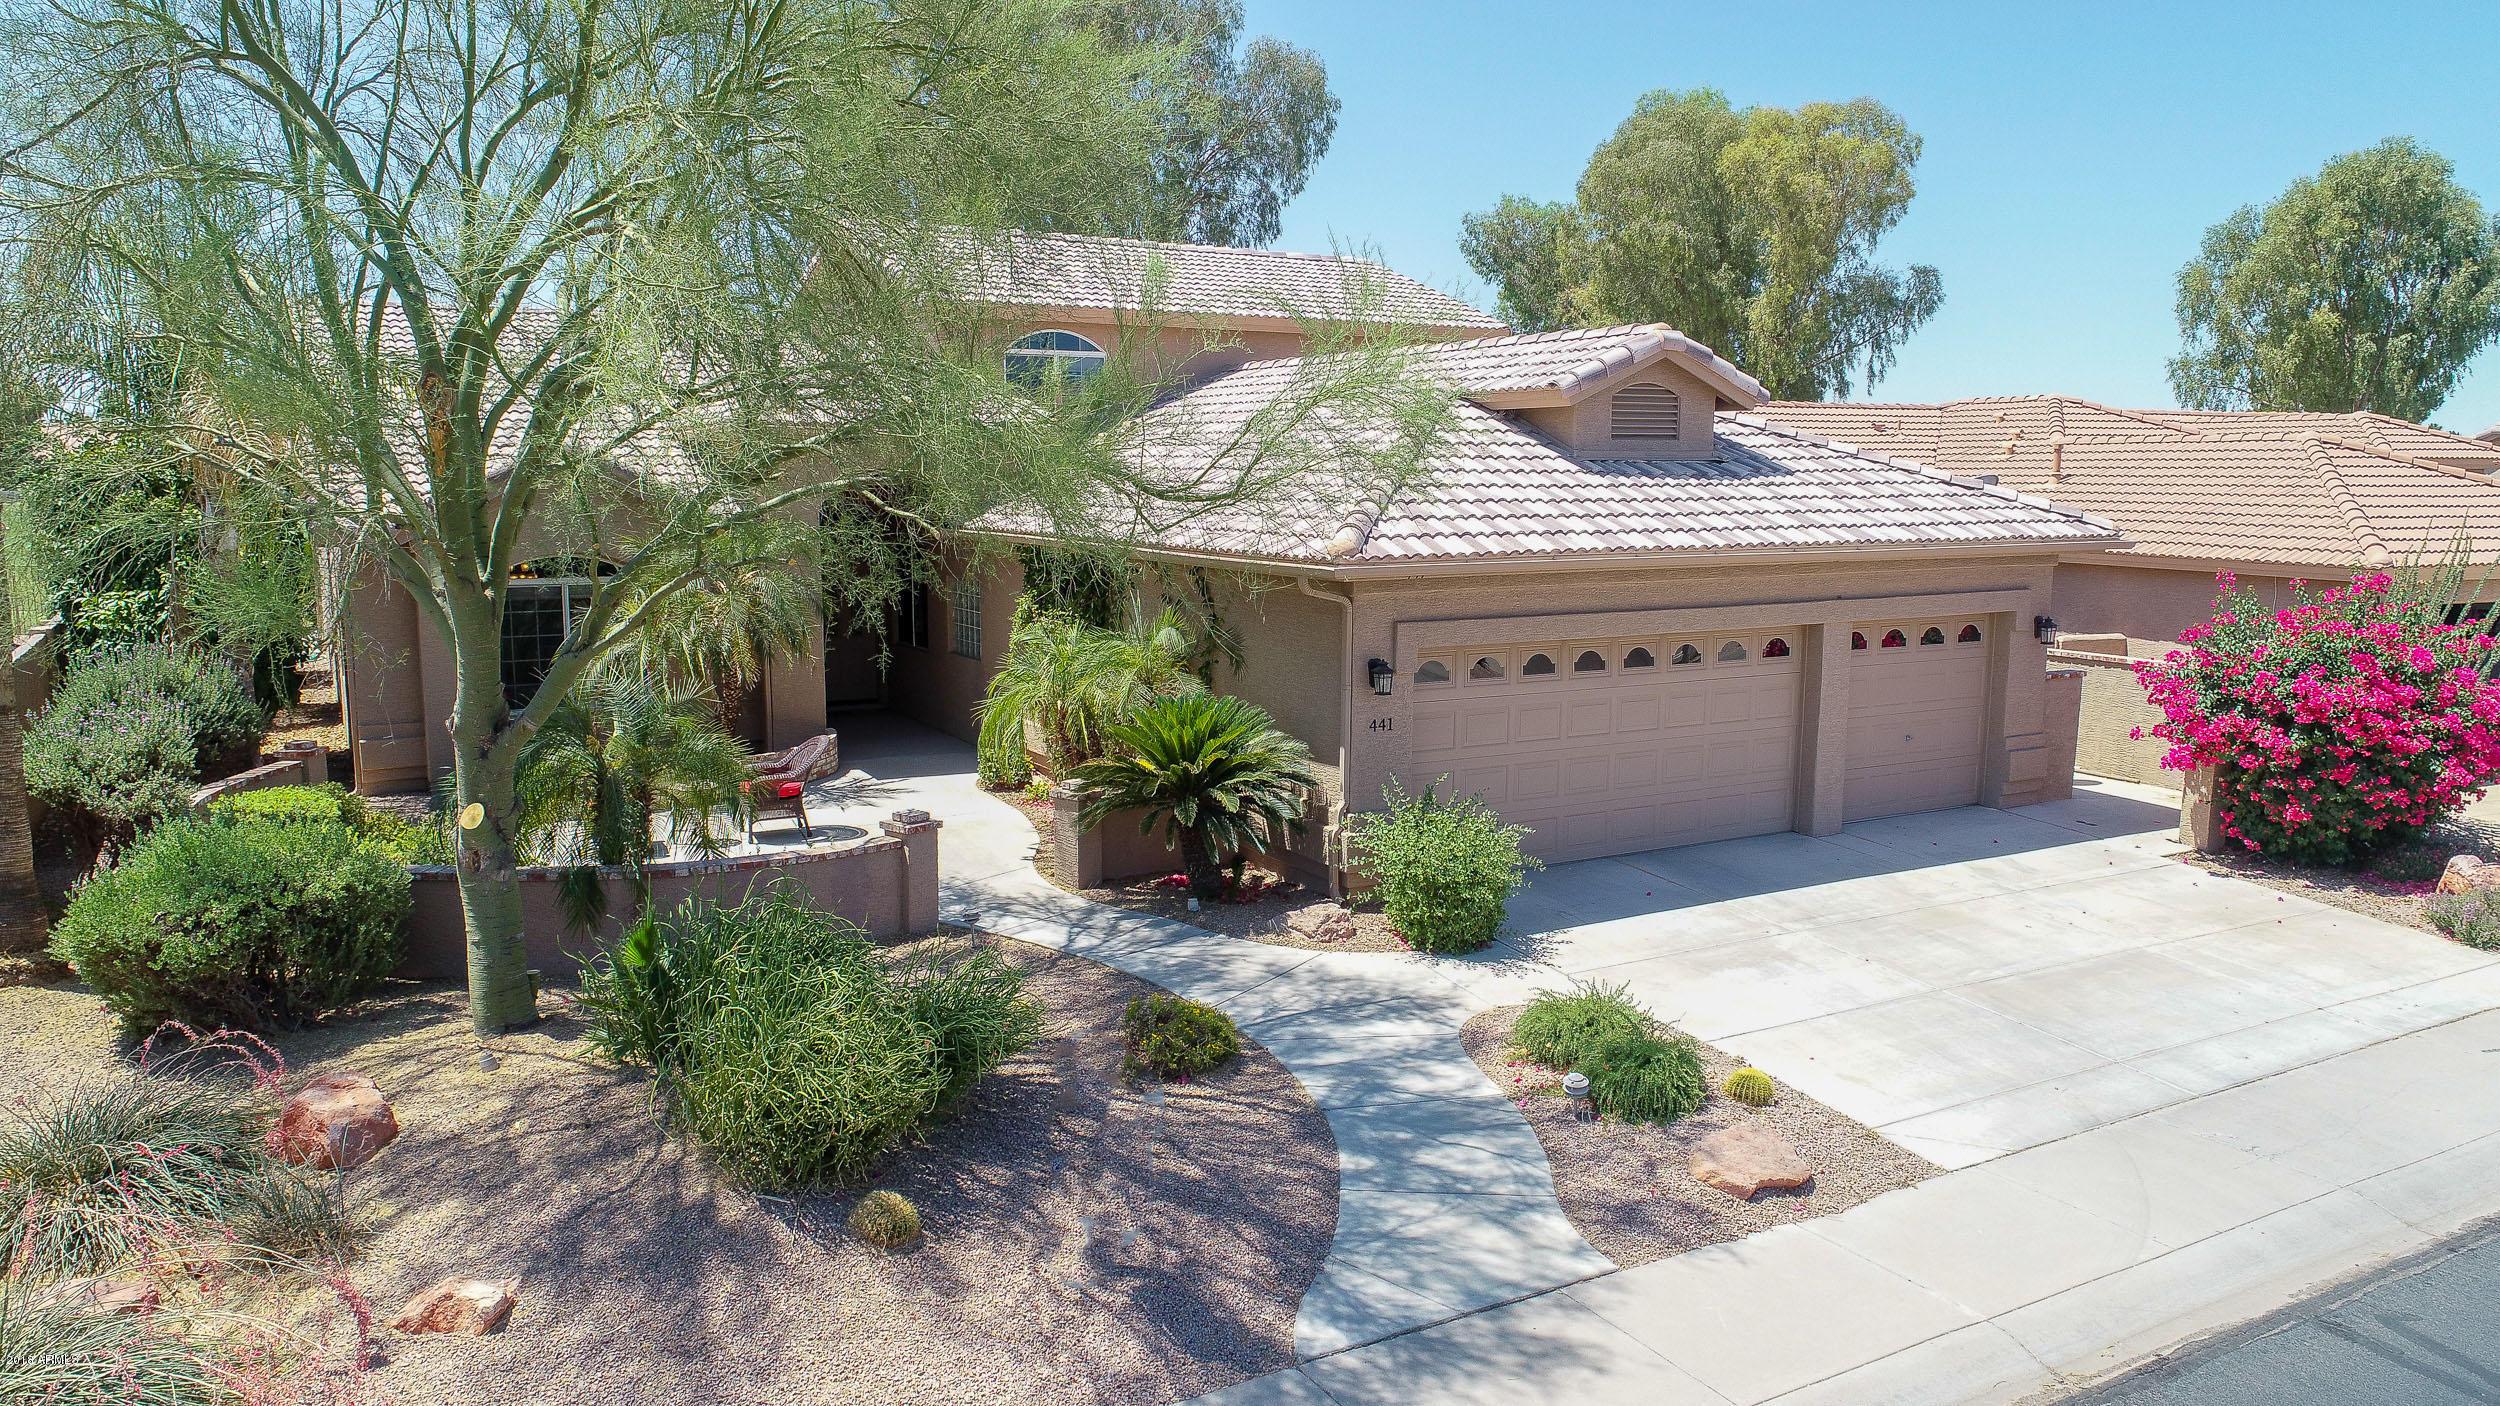 Photo for 441 W Cherrywood Drive, Sun Lakes, AZ 85248 (MLS # 5779904)